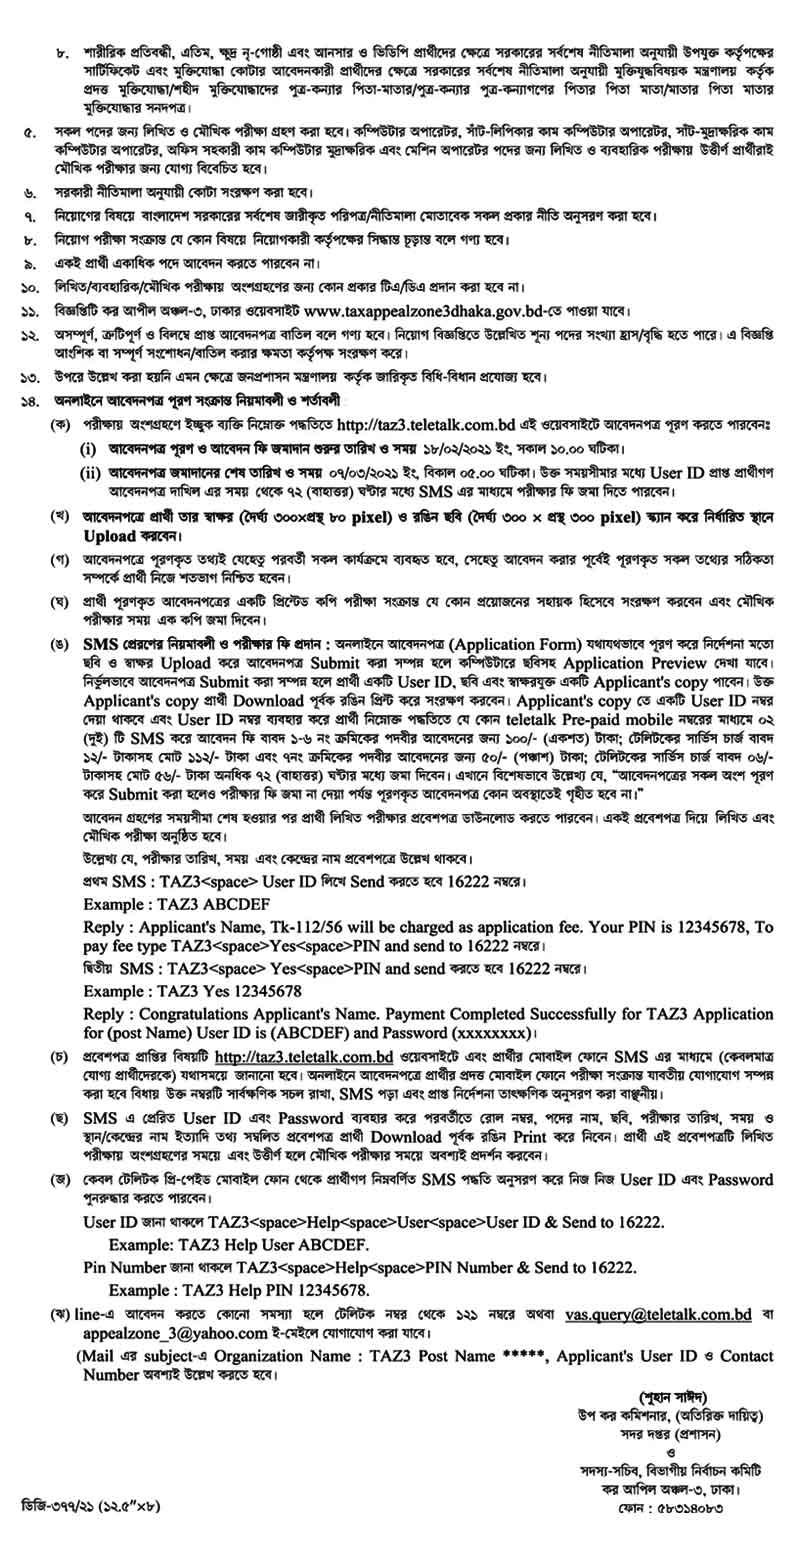 Tax-Commissioner-office-Job-circular-02